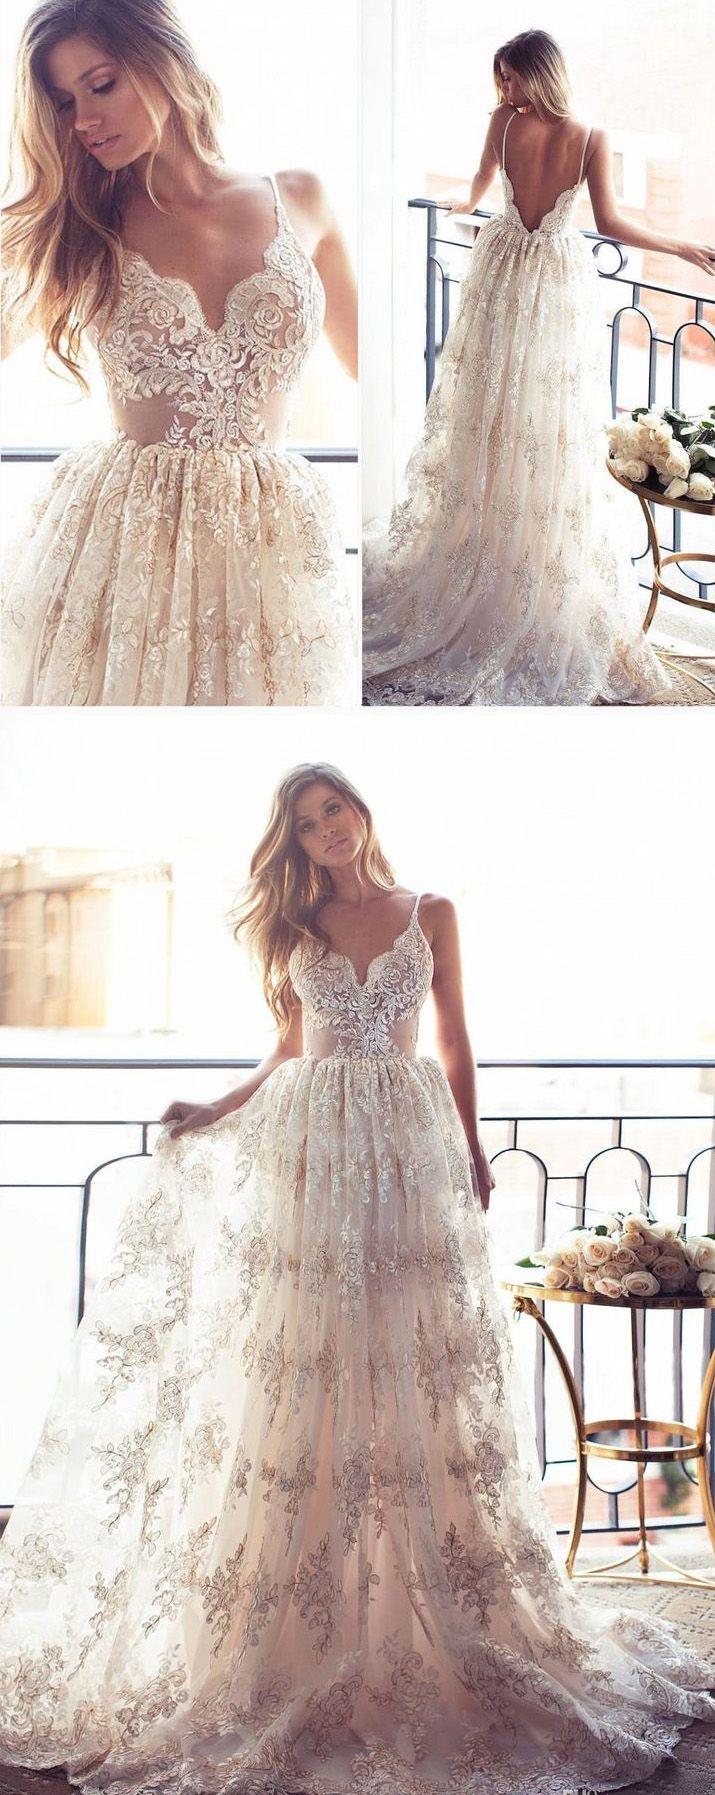 Long prom dresses lace prom dresses champagne prom dresses